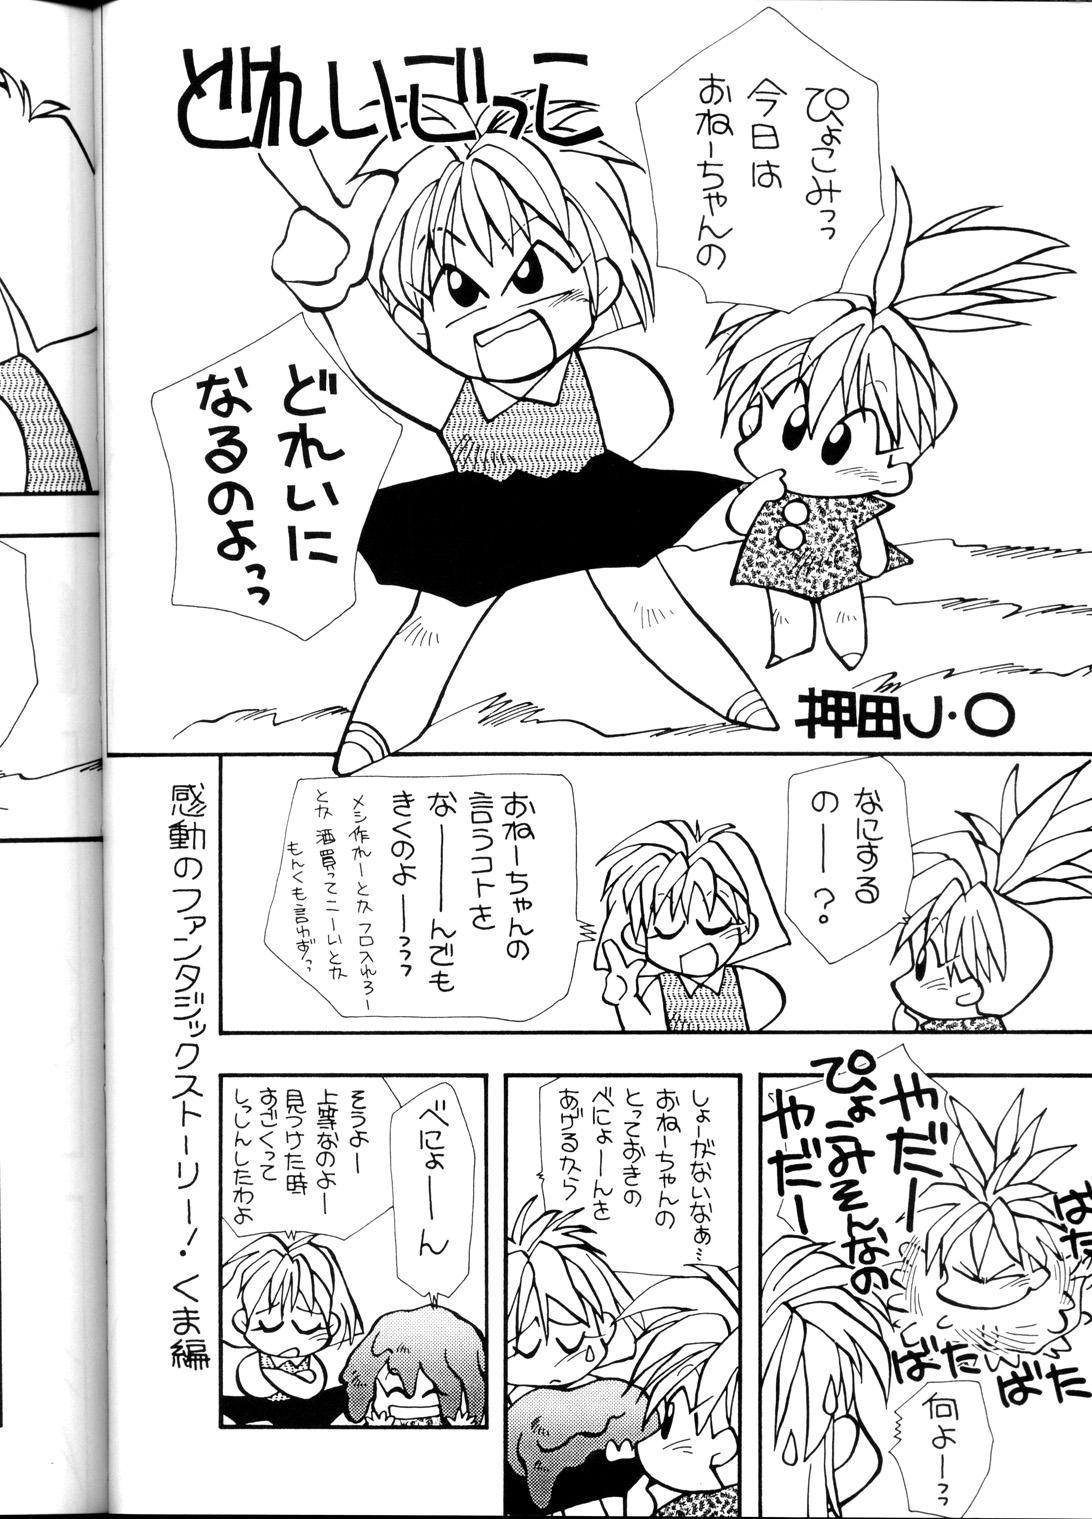 [B.B.C] Tenchi Muyou! Ryou-ou-ki Kaiteiben (Tenchi Muyou!) 58